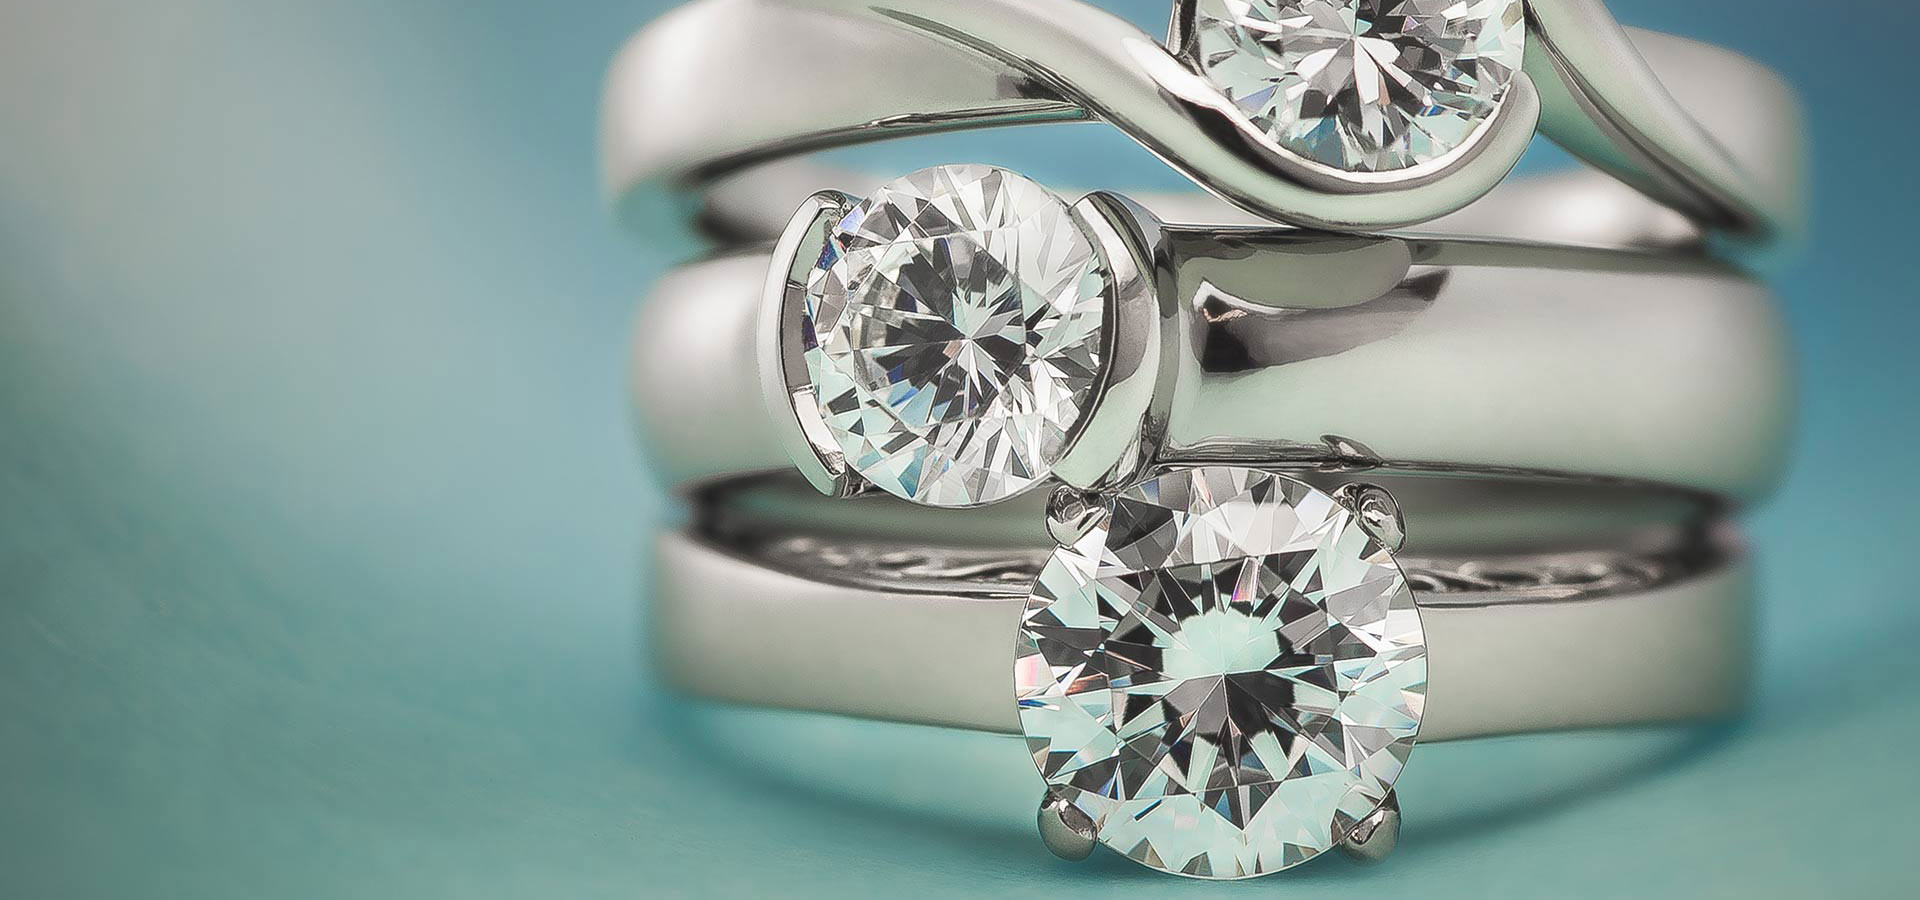 Designer Enement Rings   How To Design Your Own Unique Custom Engagement Ring